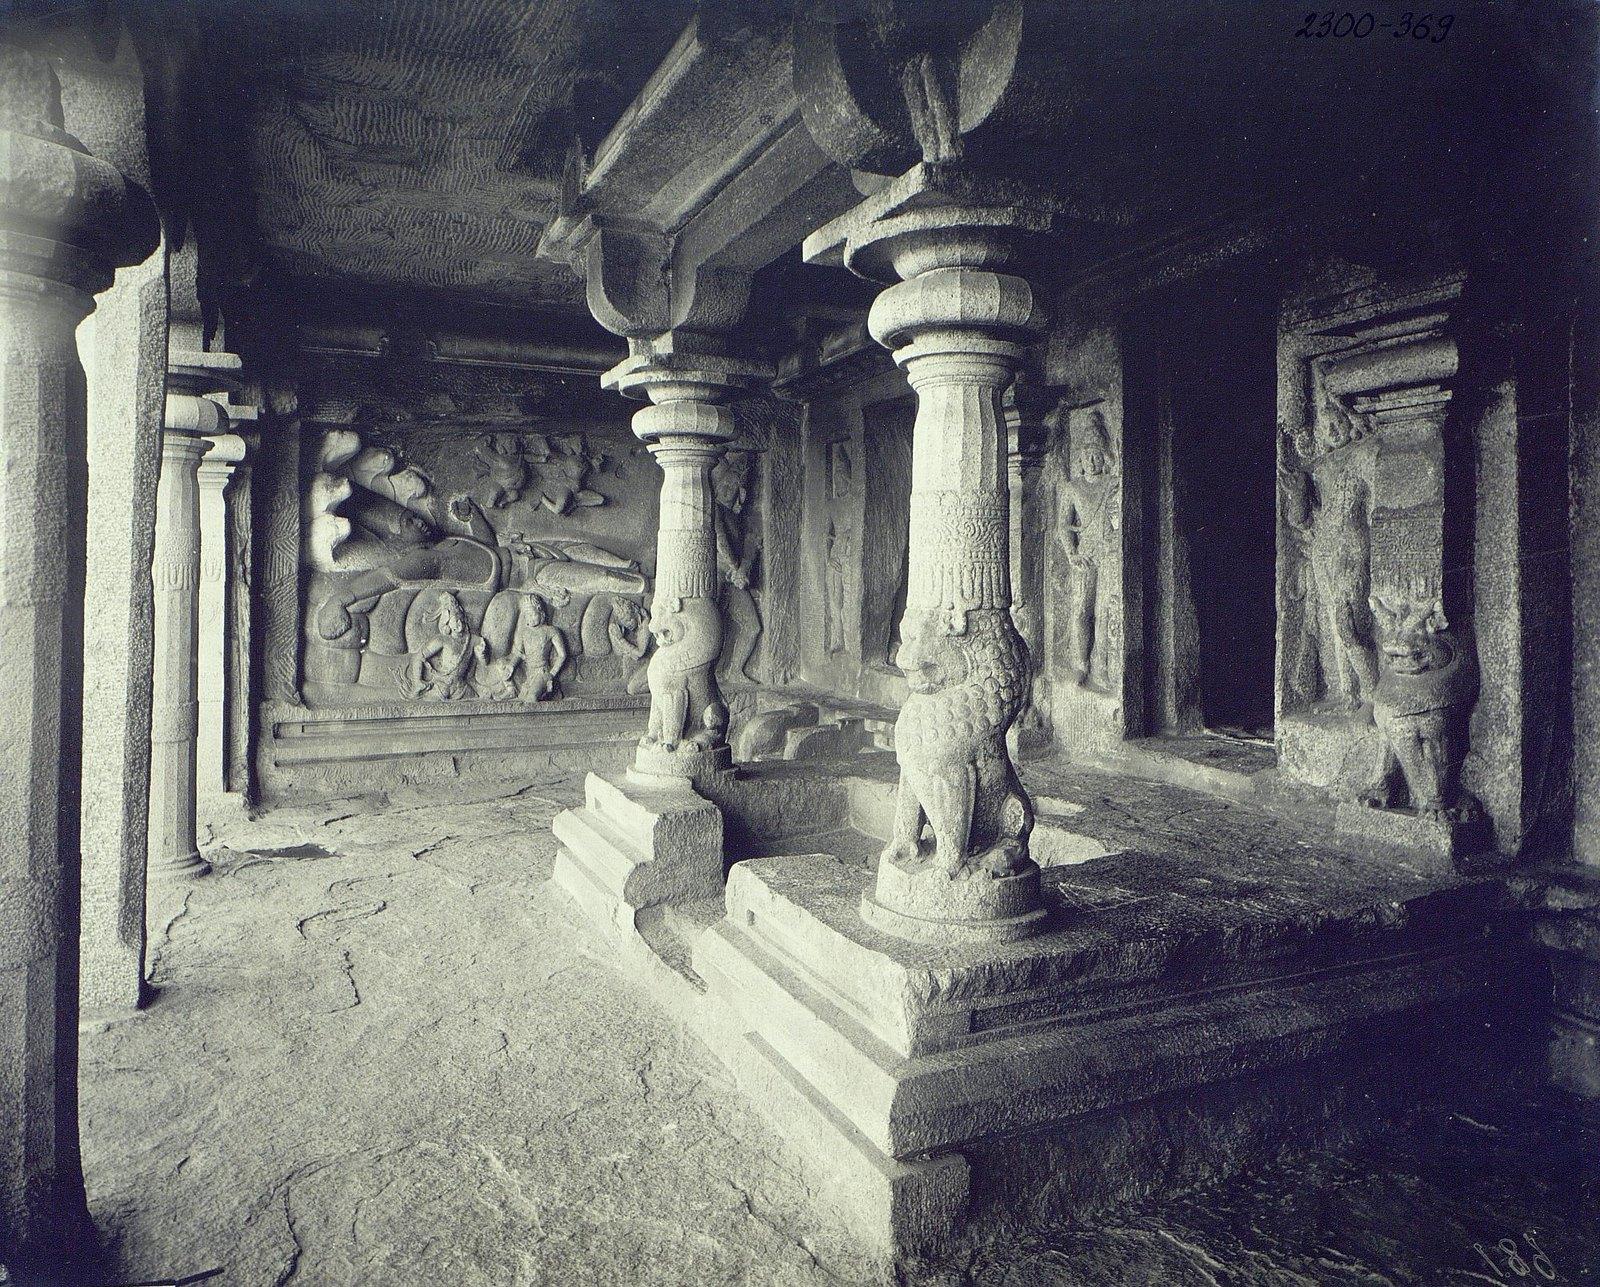 12. Мамаллапур (фрагмент входа в храм)